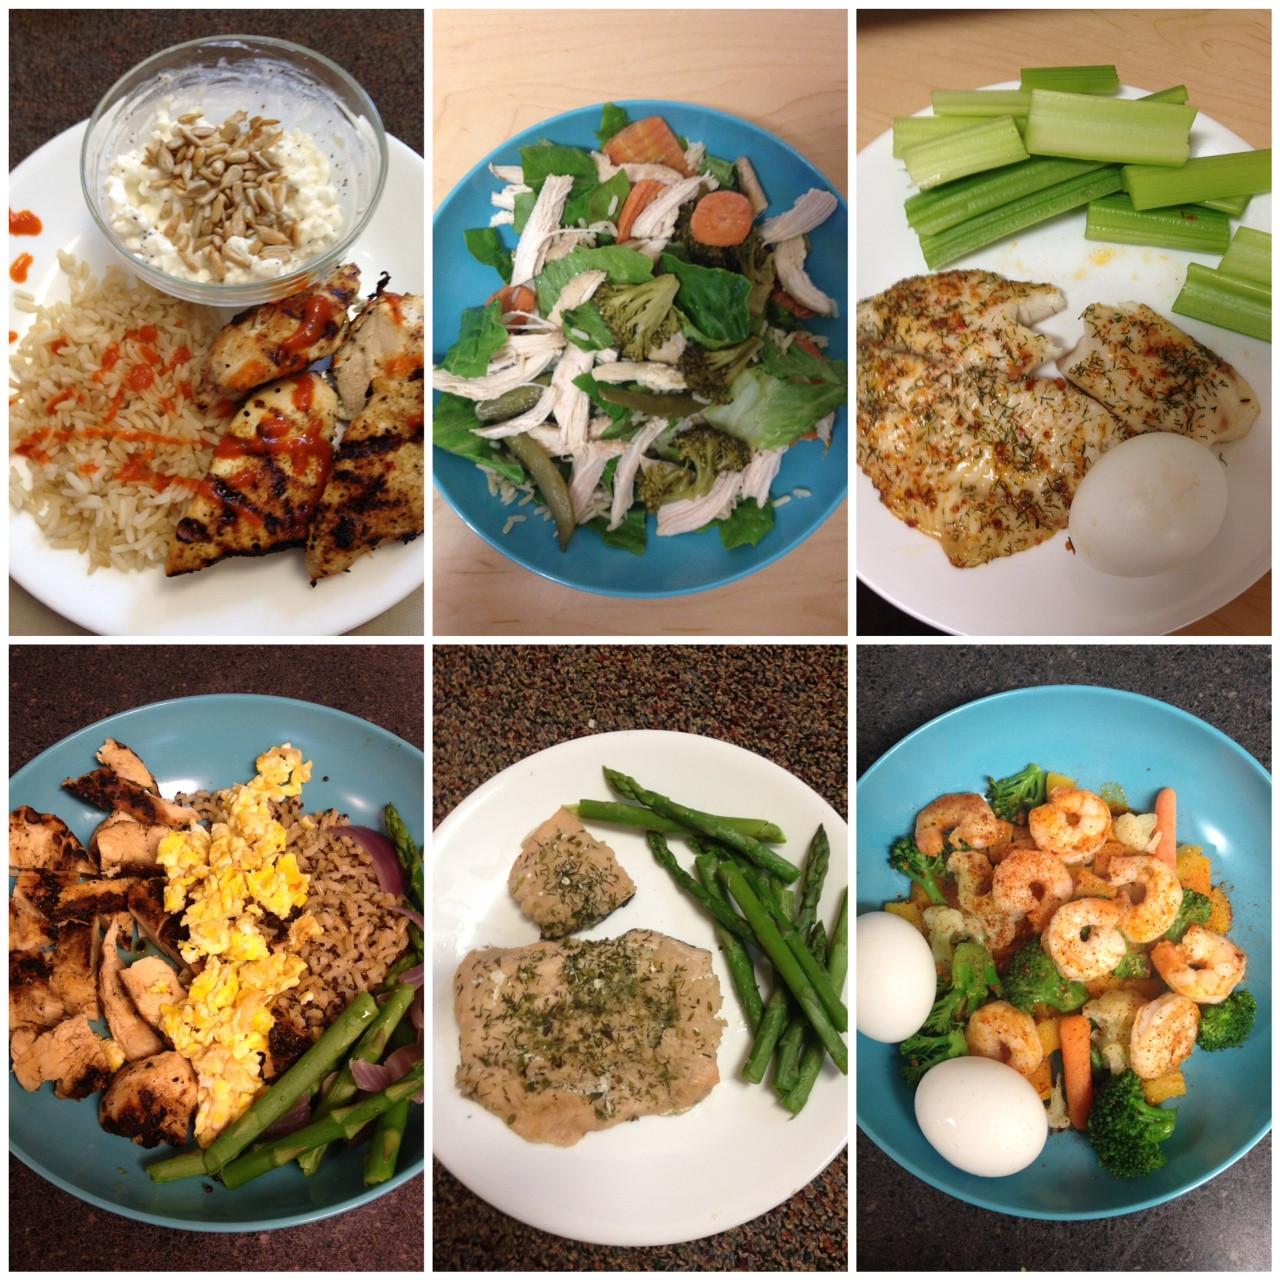 Diet Dinner Recipes  DAILY DIET MEAL IDEAS Lauren Gleisberg